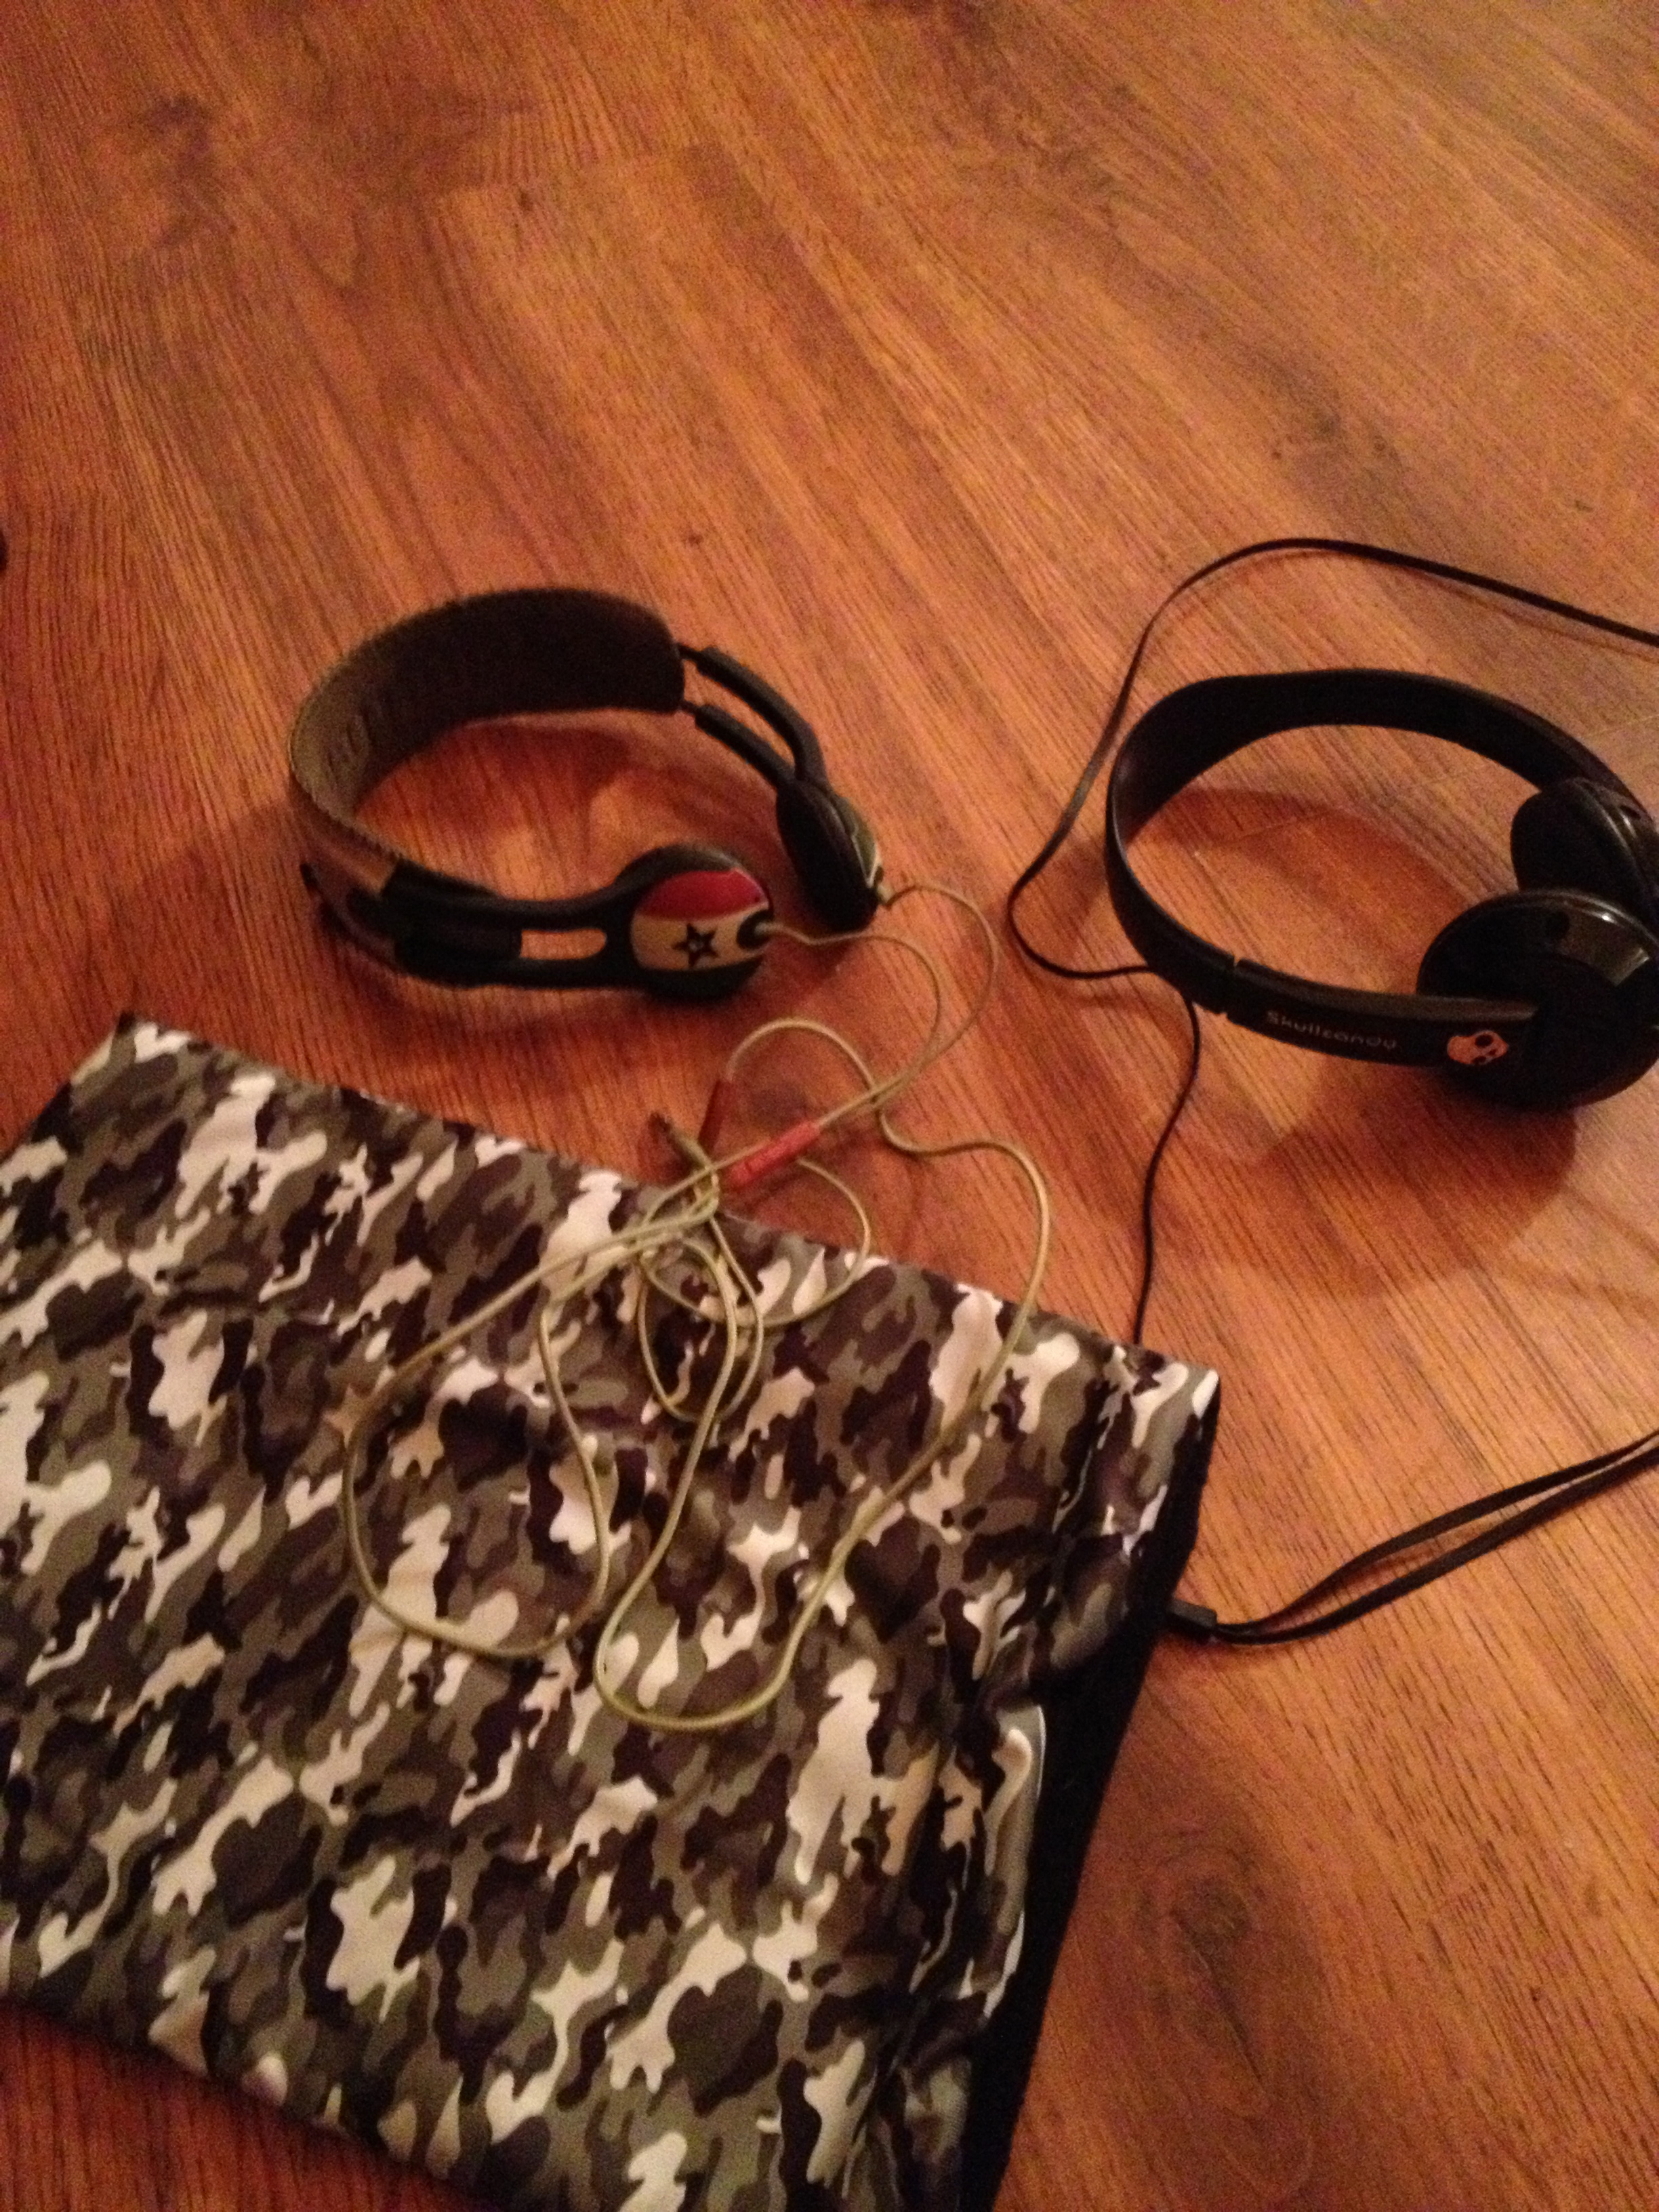 Headphones and phunkshun